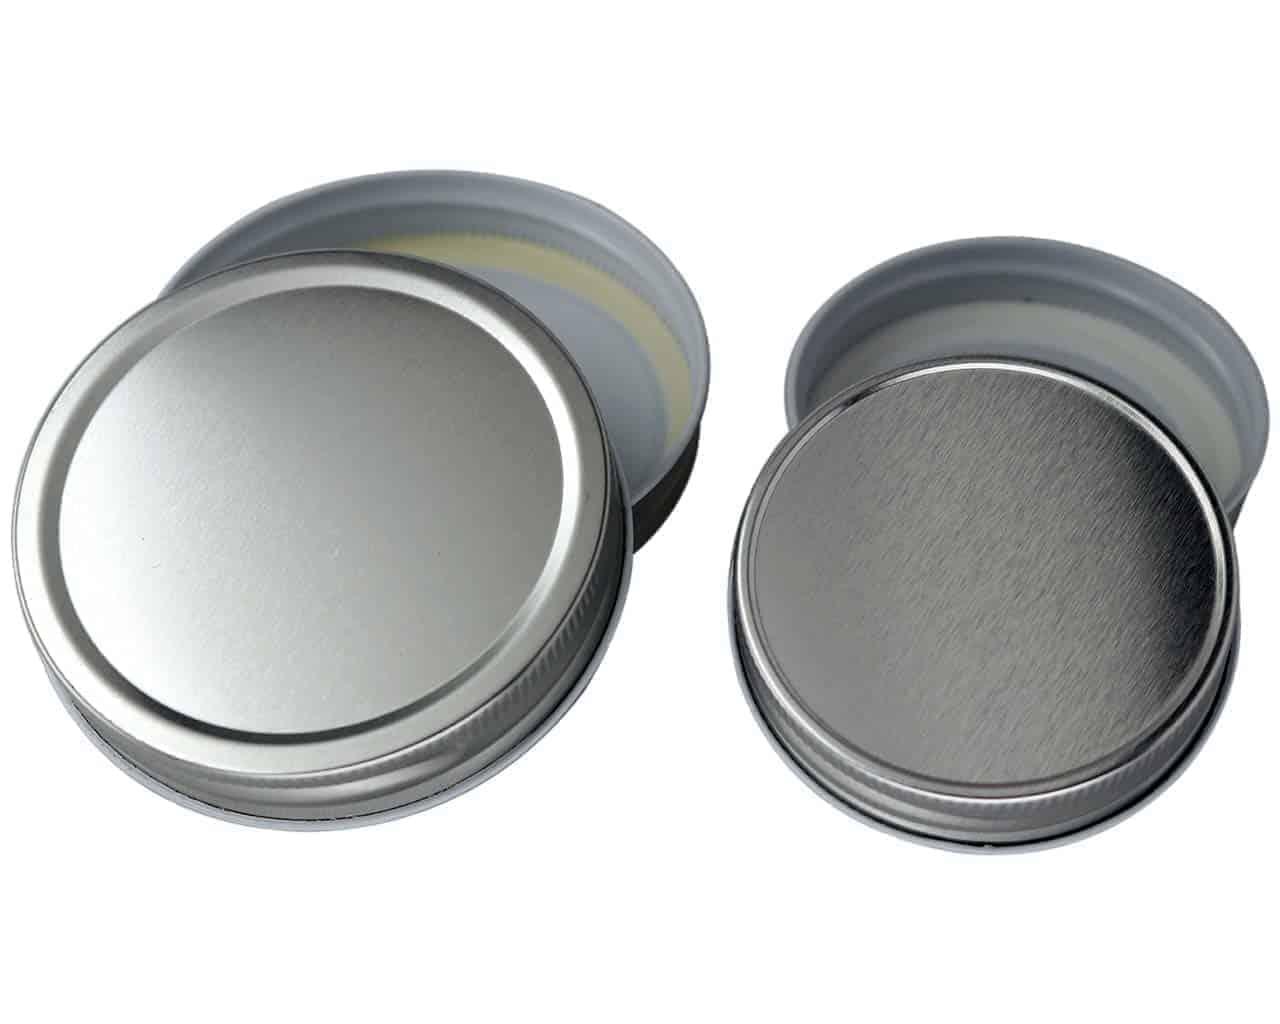 Split-Type Lids Sealing Storage Solid Caps For Regular//Wide Mouth Jar Mason O6I7